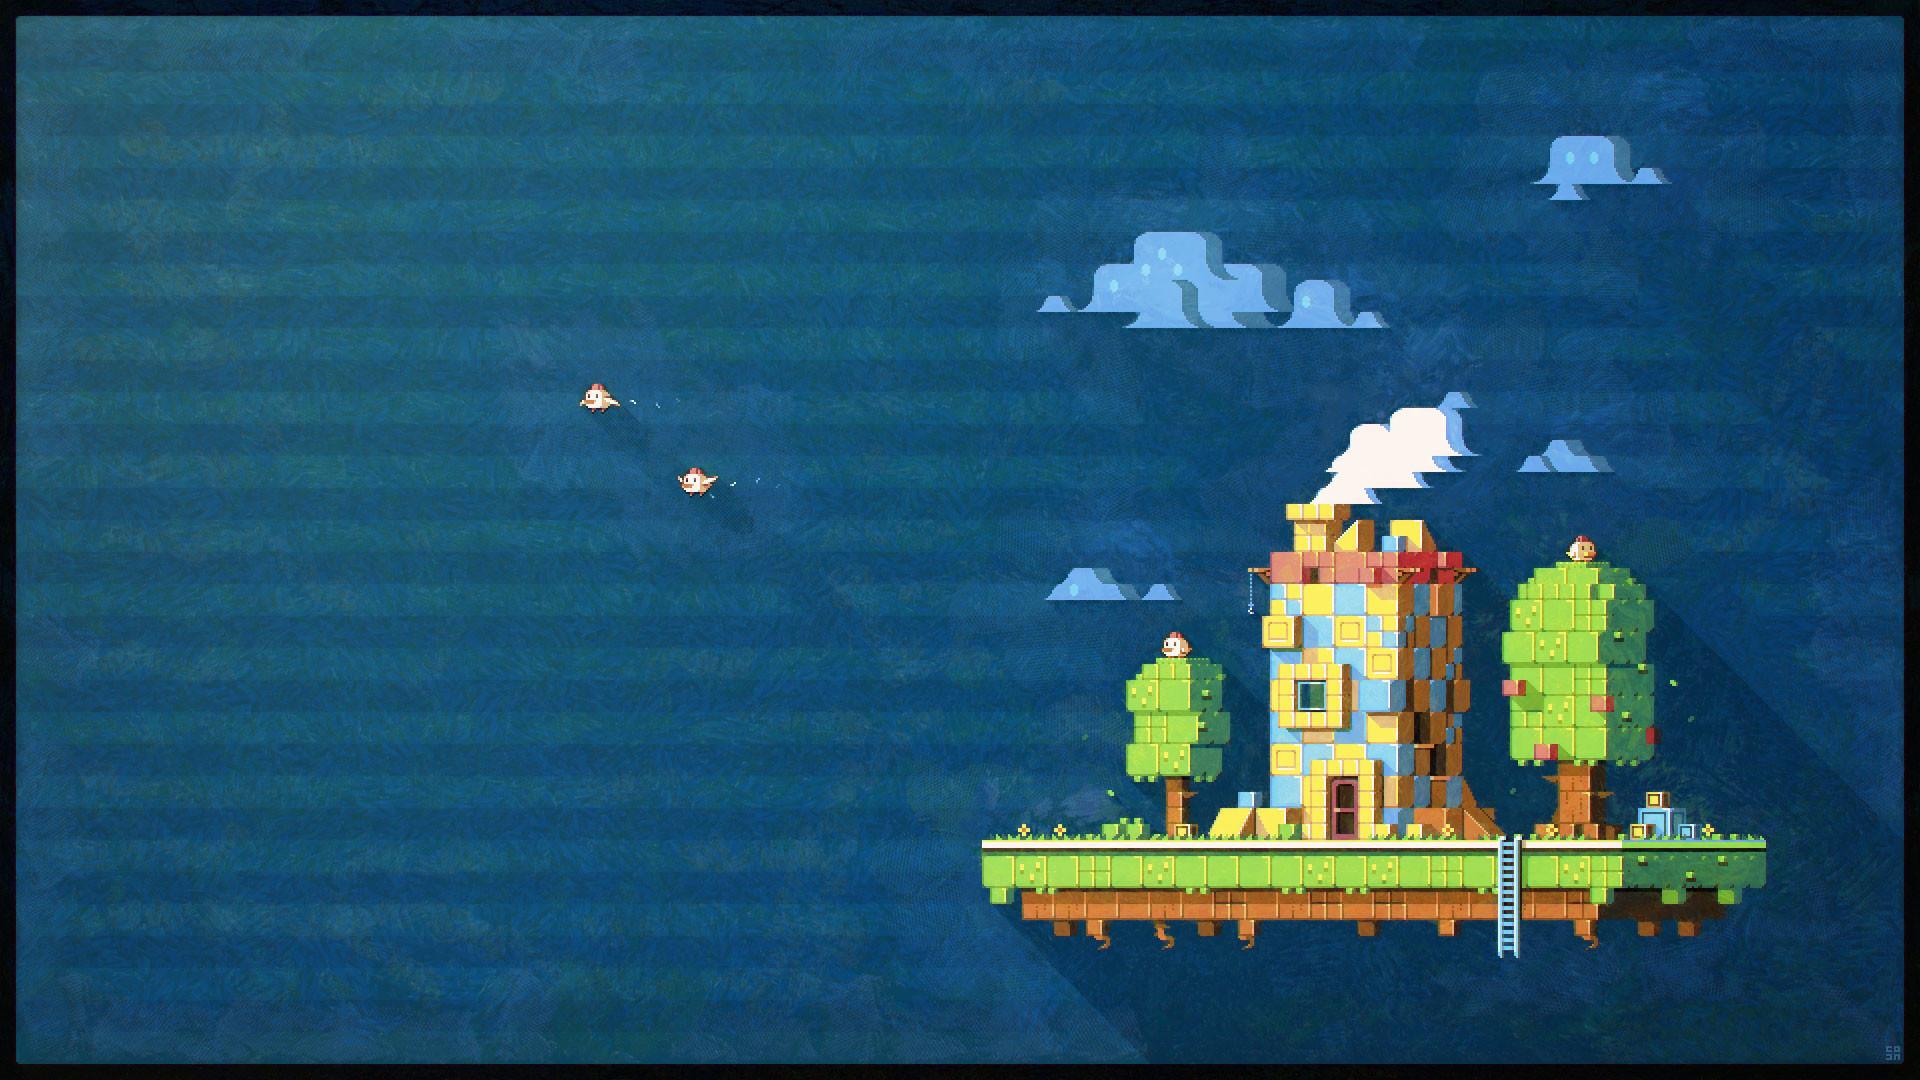 … pixel art wallpapers album on imgur pixel art wallpaper hd free  powerpoint background